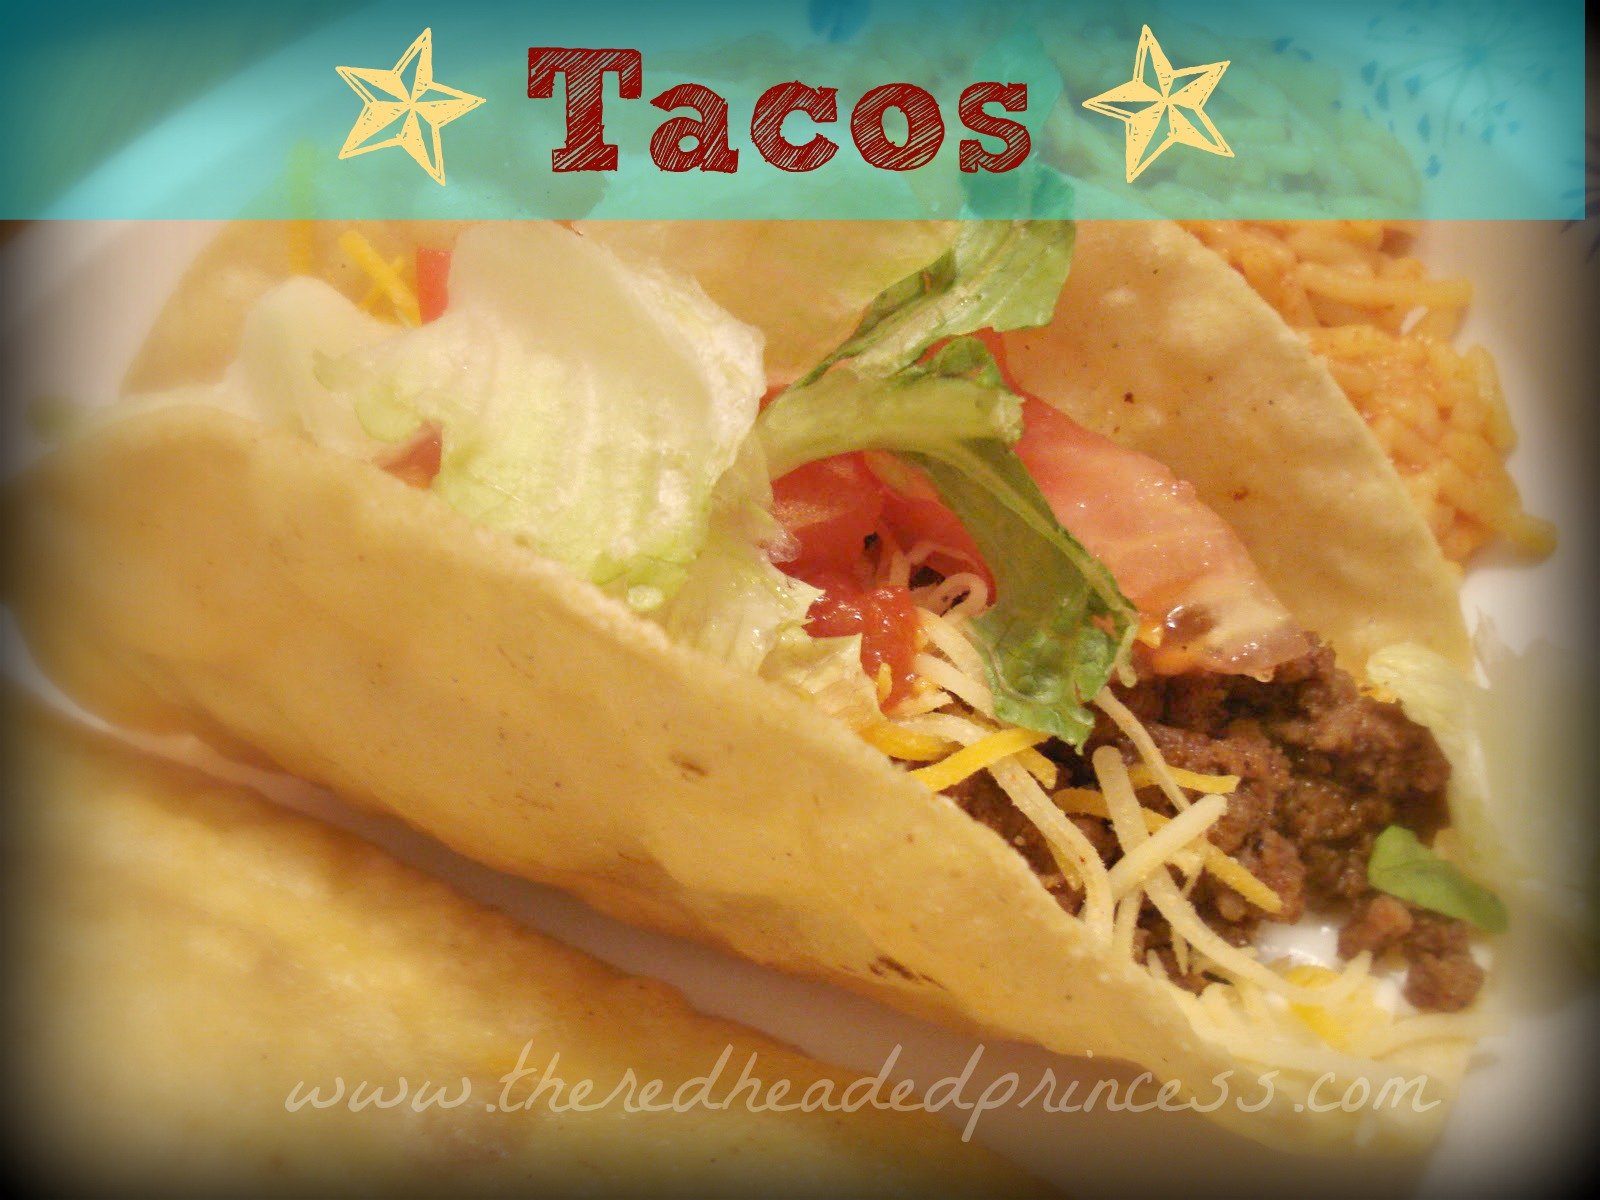 Weci's Tacos